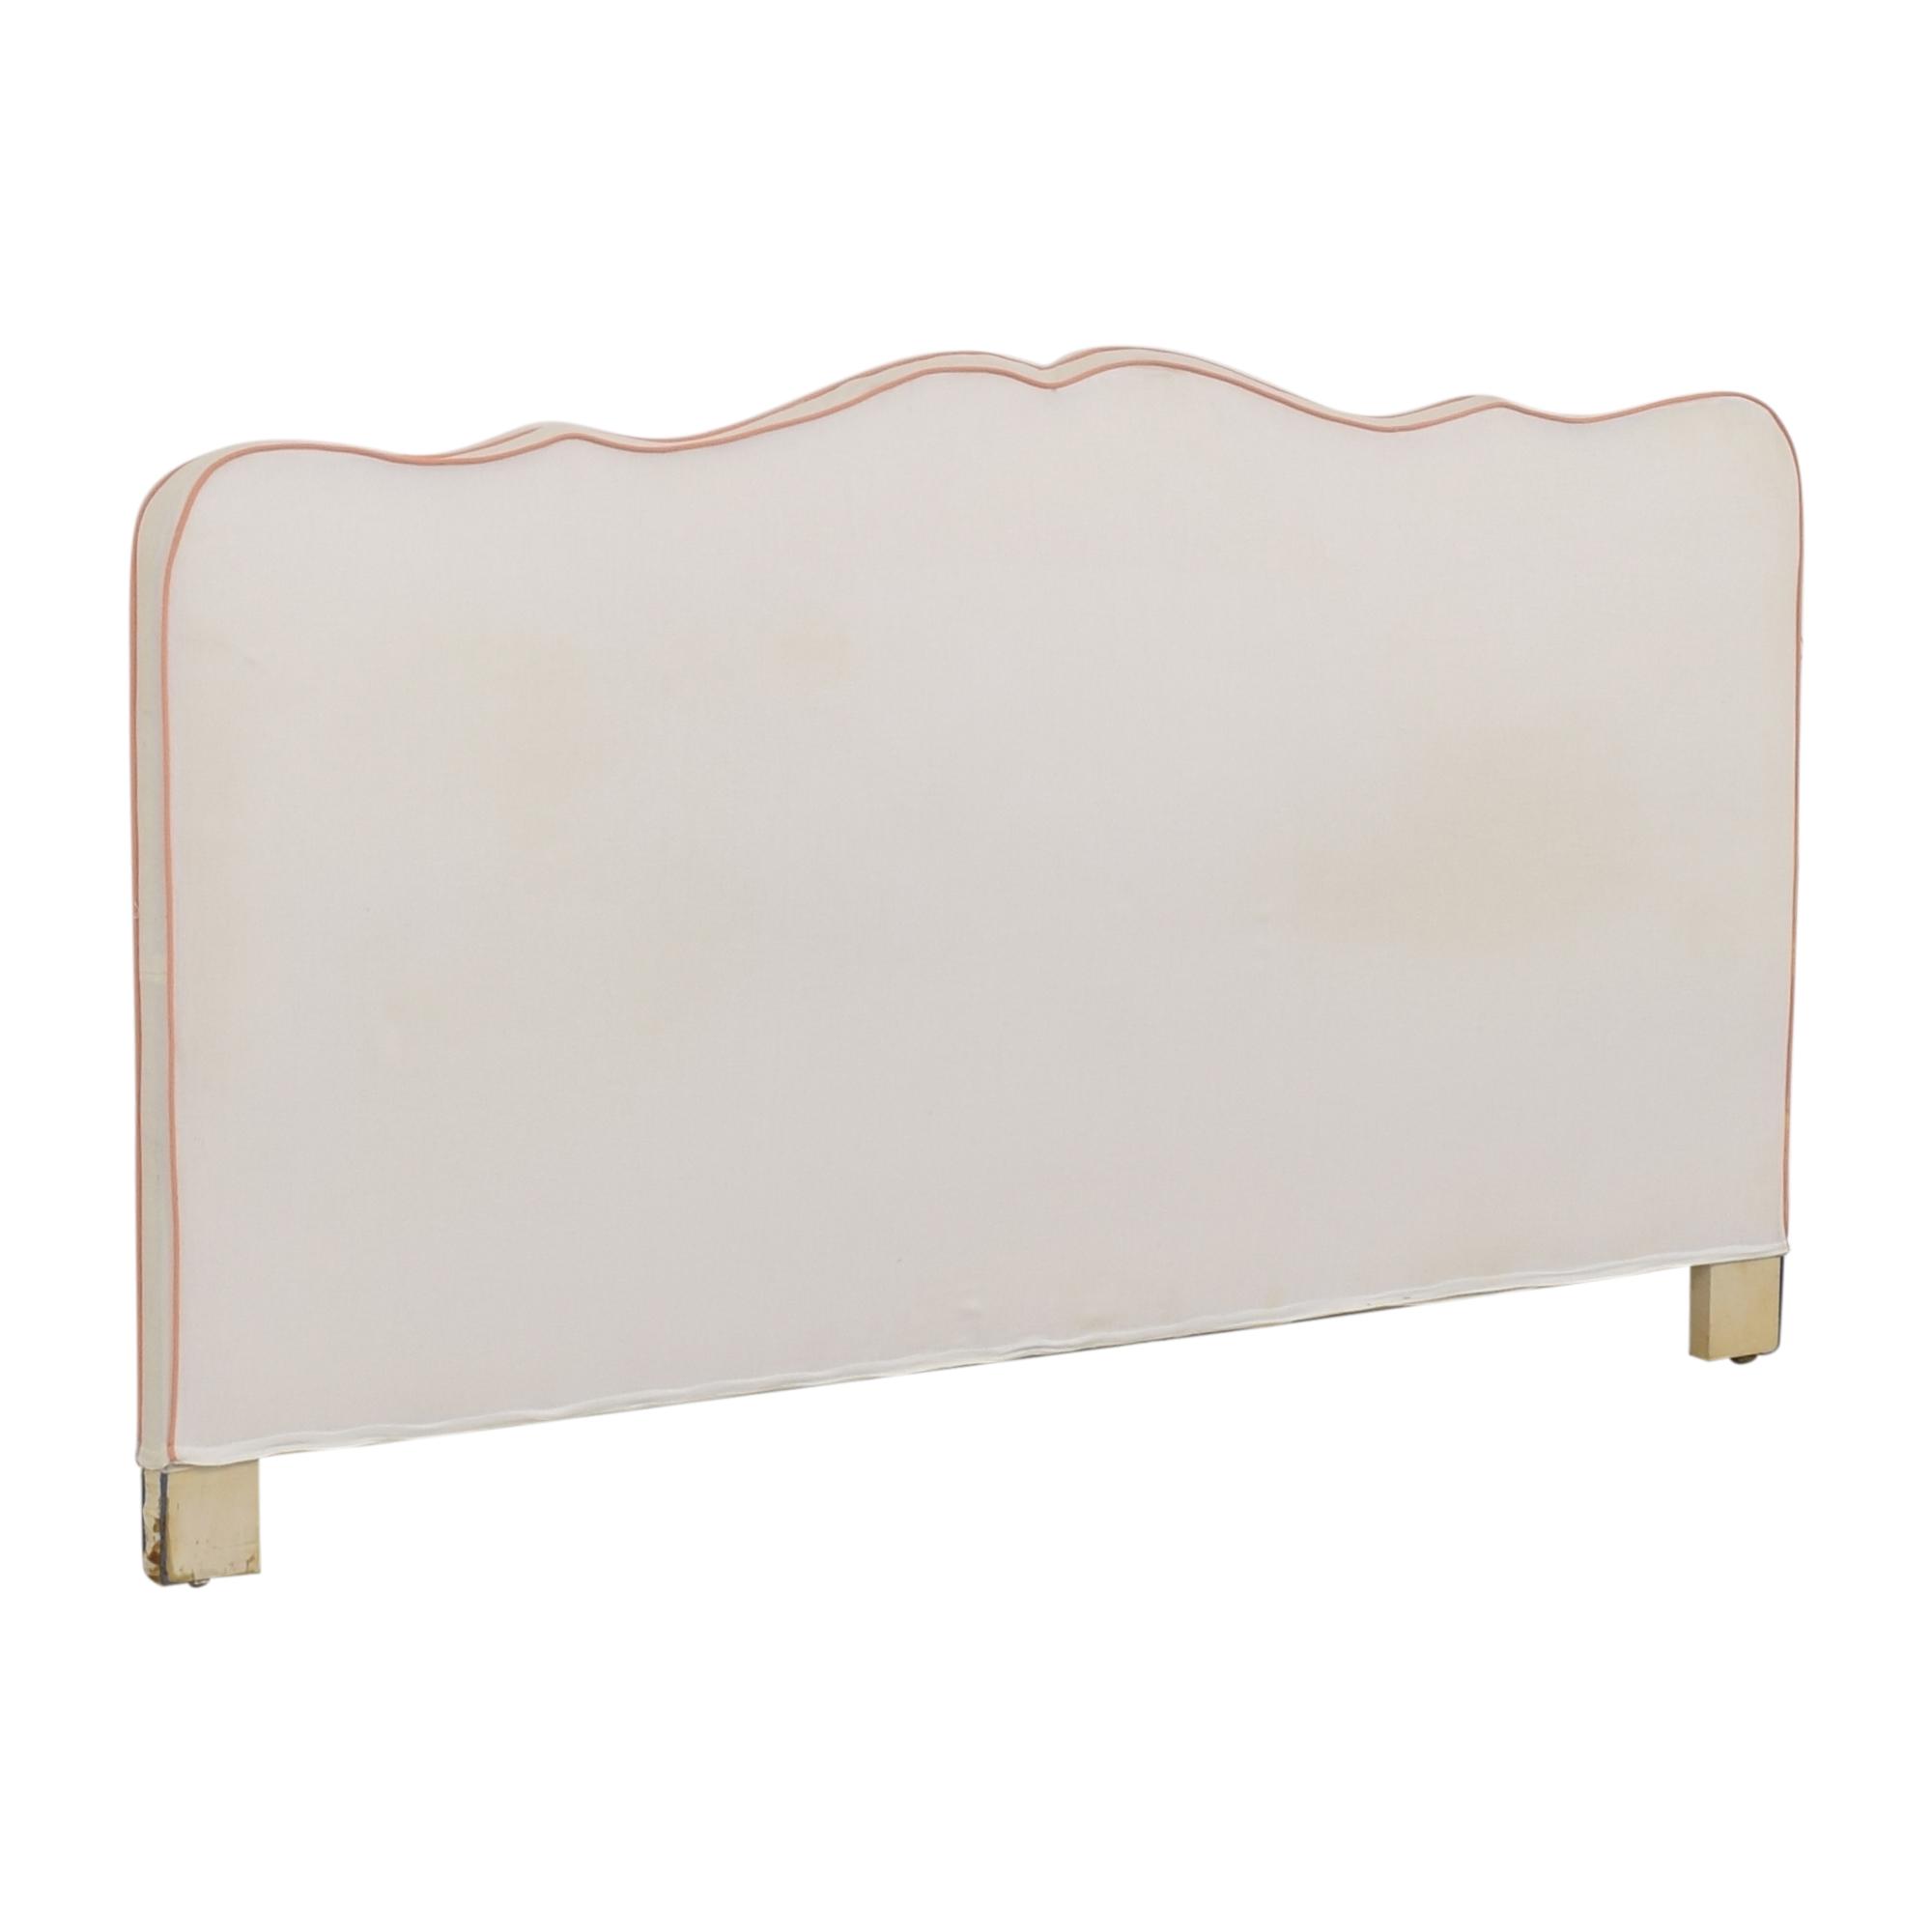 Upholstered Headboard ma